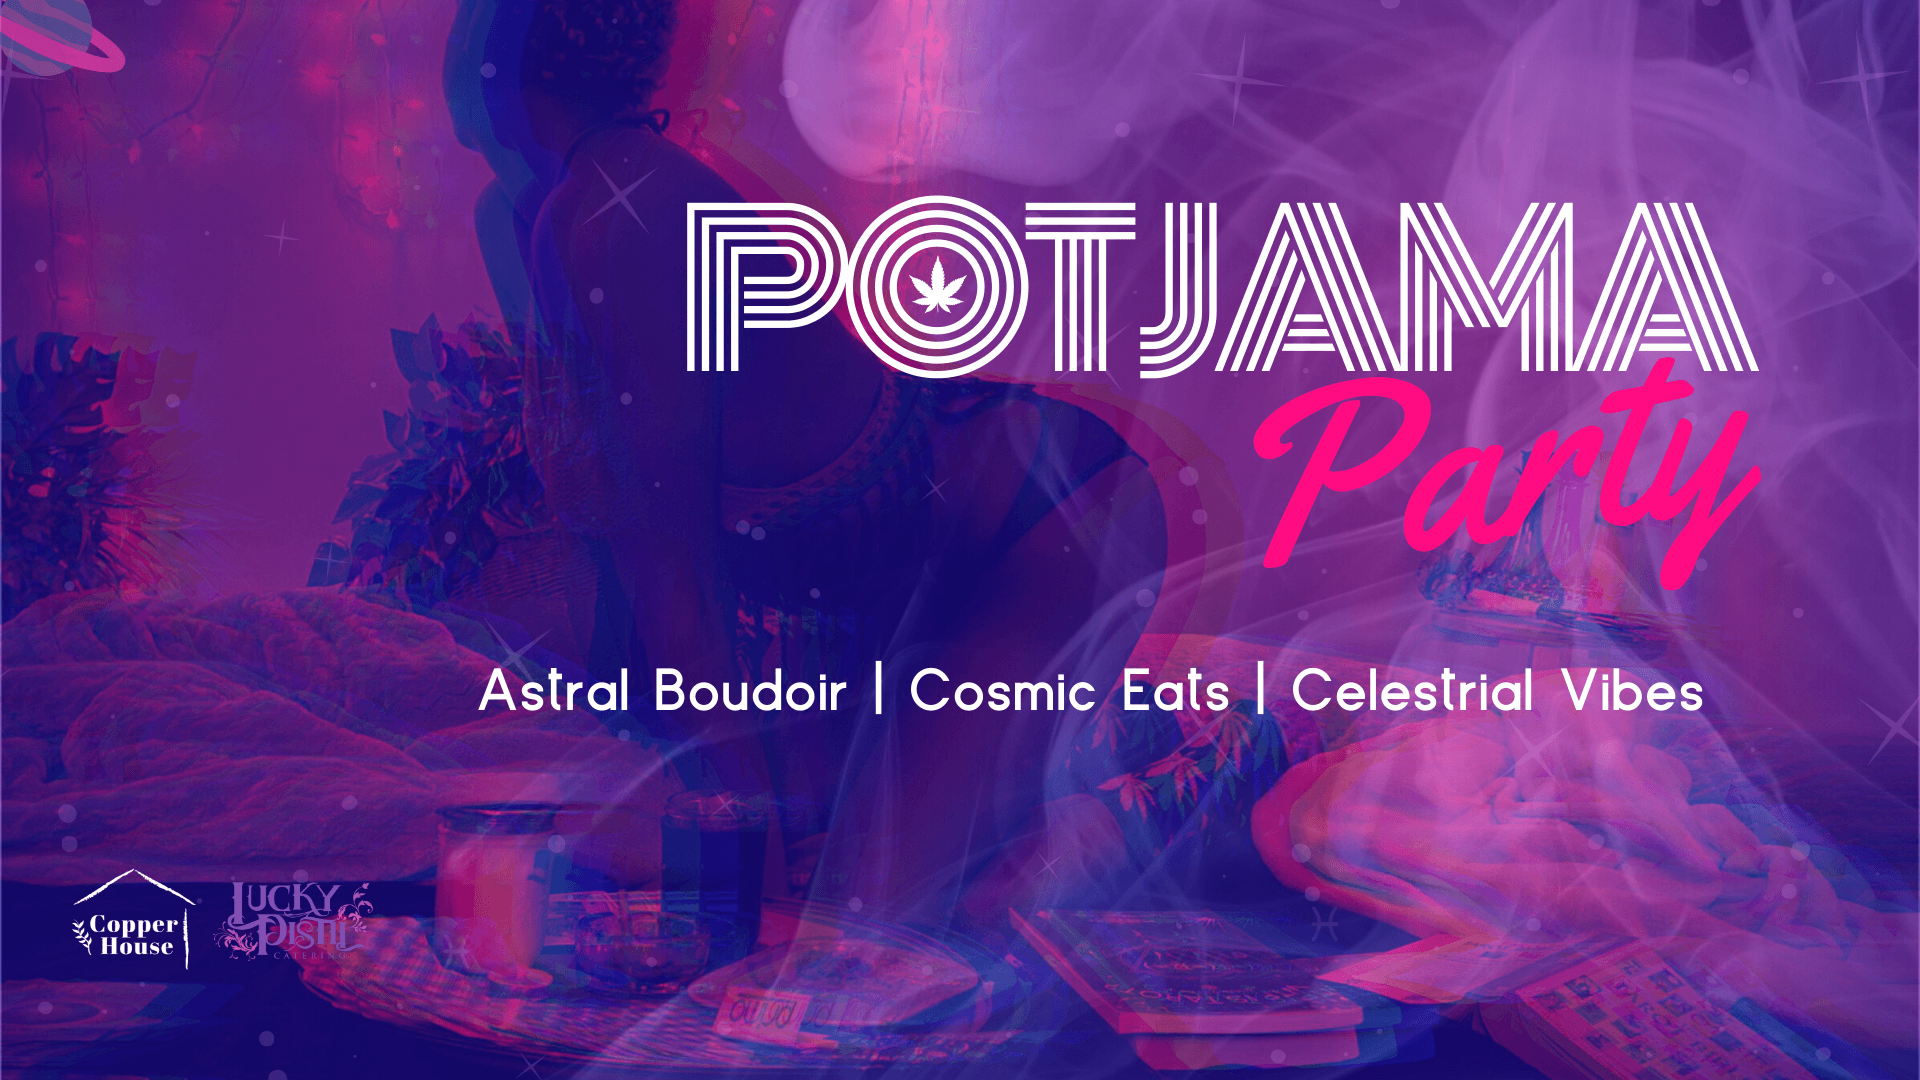 Potjama Party